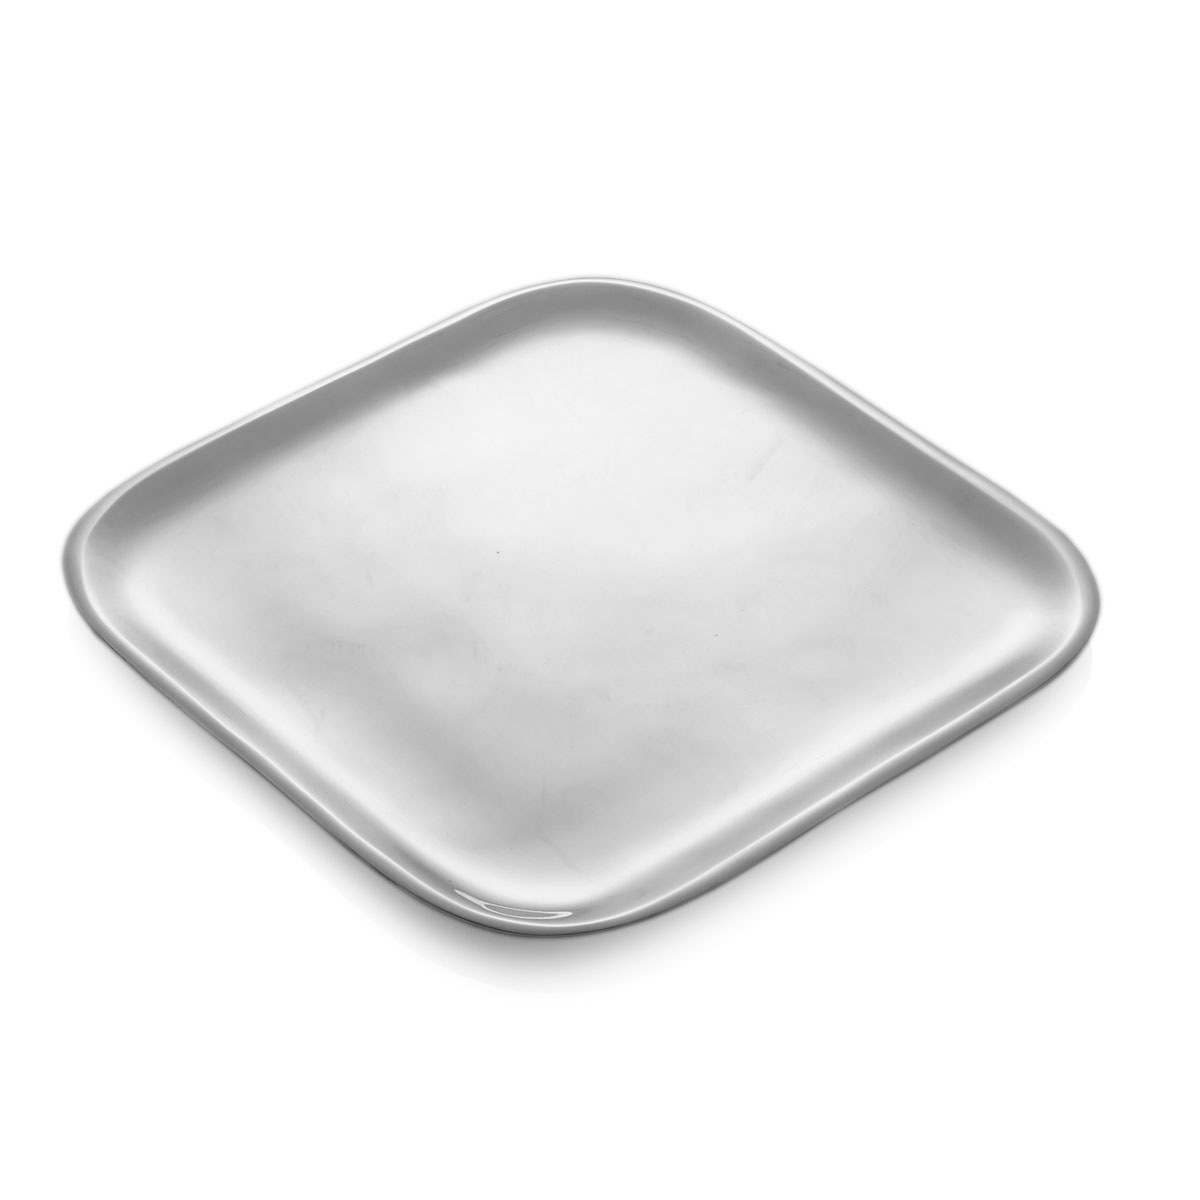 "Nambe Metal Square 9"" Salad Plate"